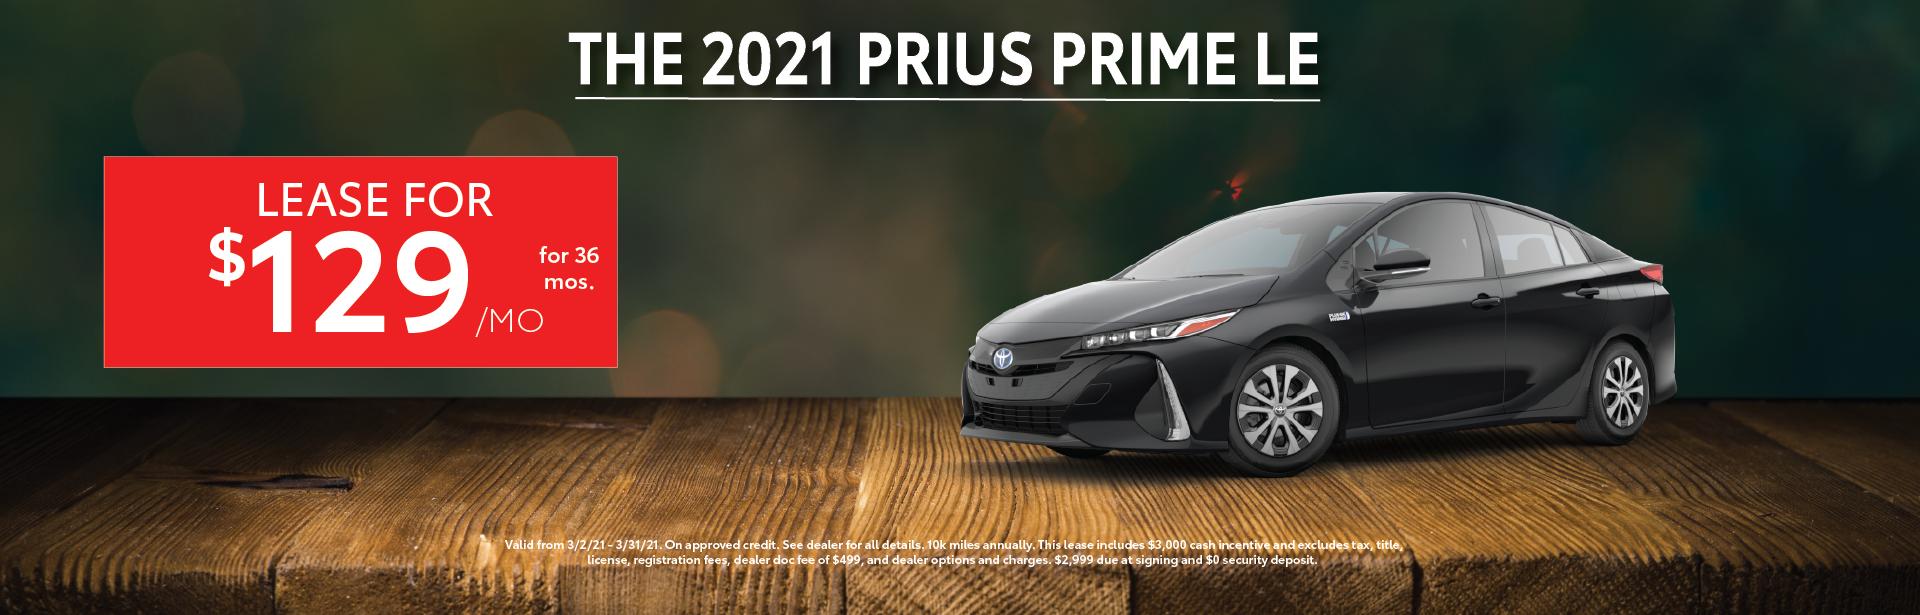 Mar. 2021 – Prius Prime Lease – Lynch Homepage